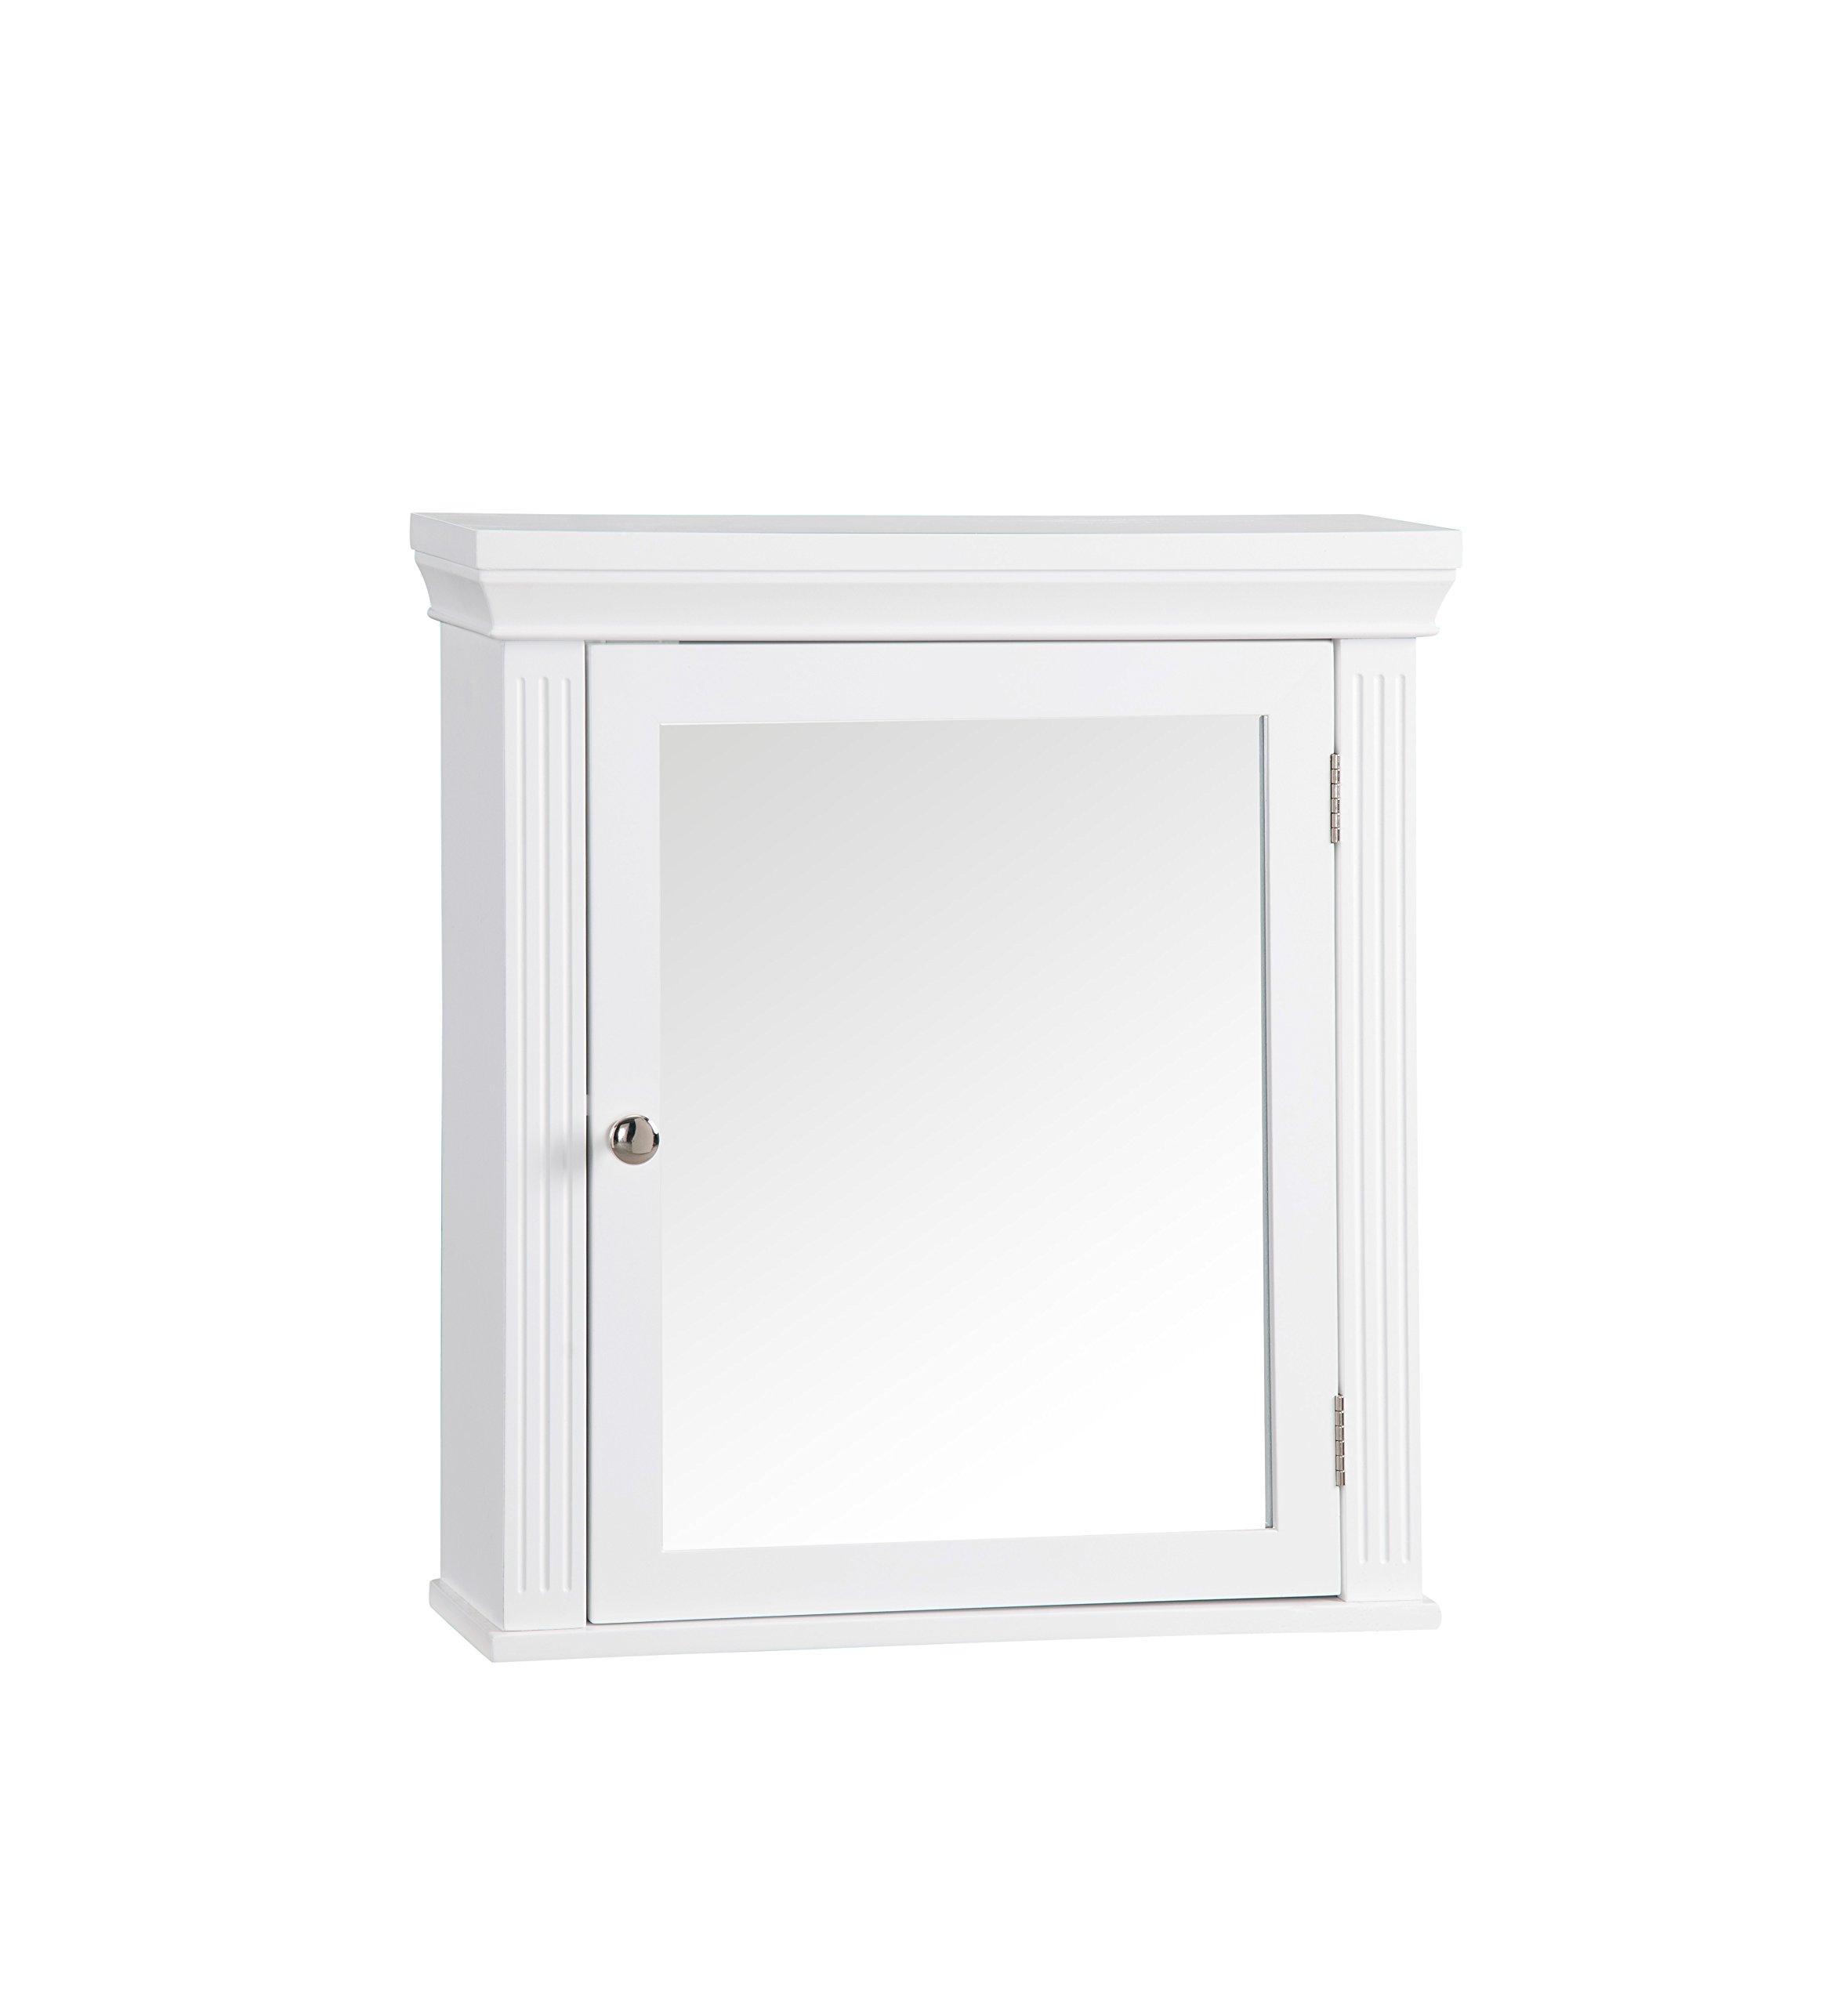 Elegant Home Fashions TYG-625442 Sycamore Medicine Cabinet